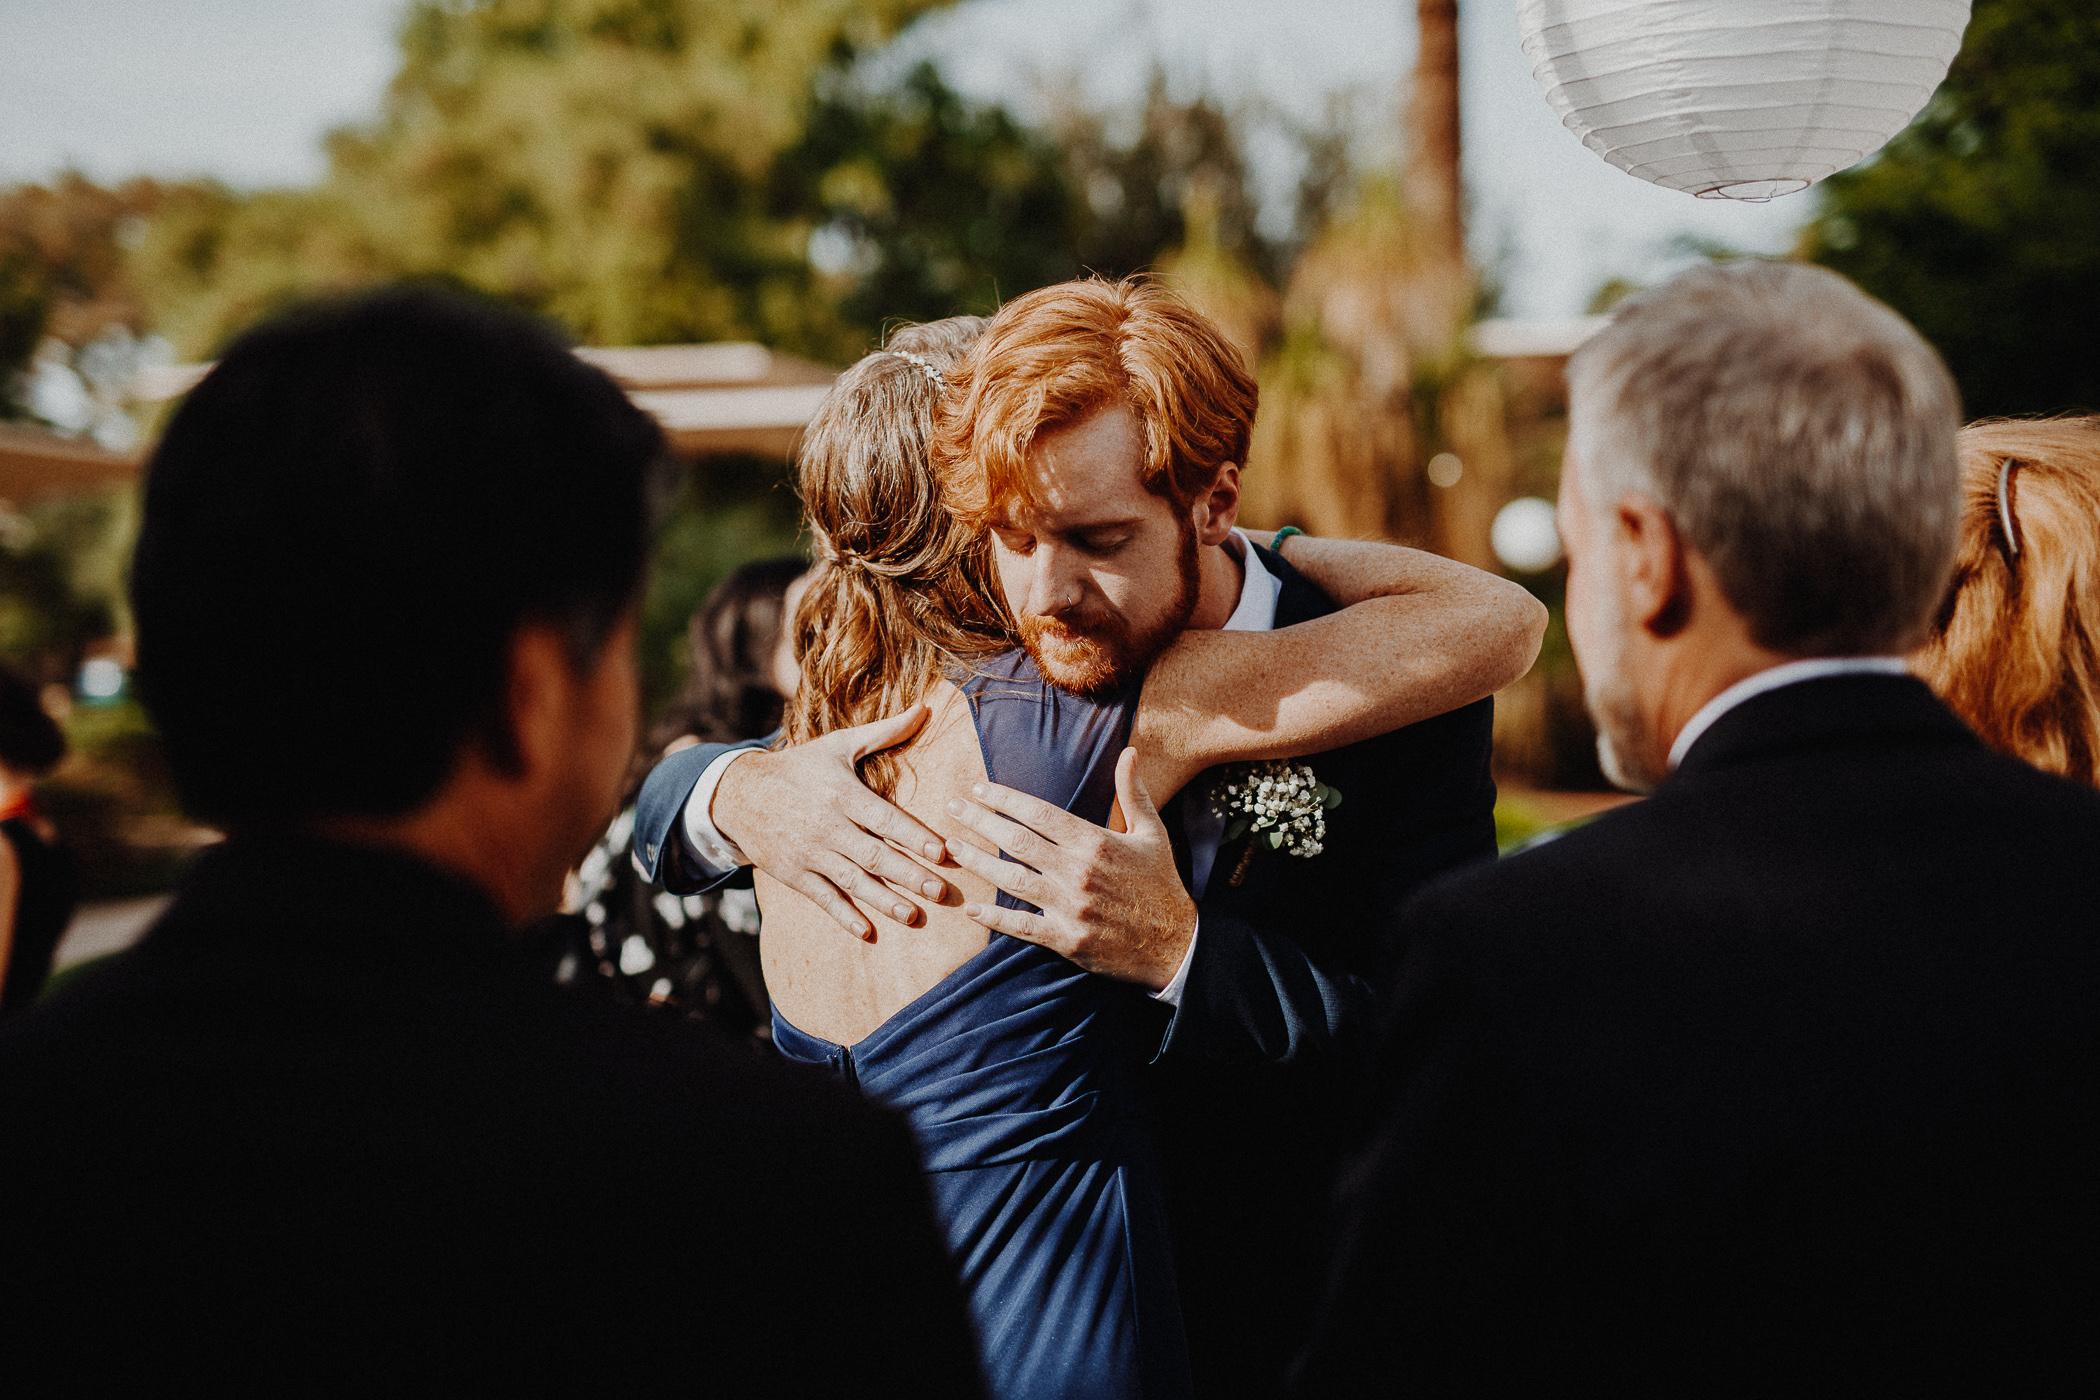 181104-Luxium-Weddings-Arizona-@matt__Le-Brandon-Kariana-Phoenix-Valley-Garden-Center-1047.jpg